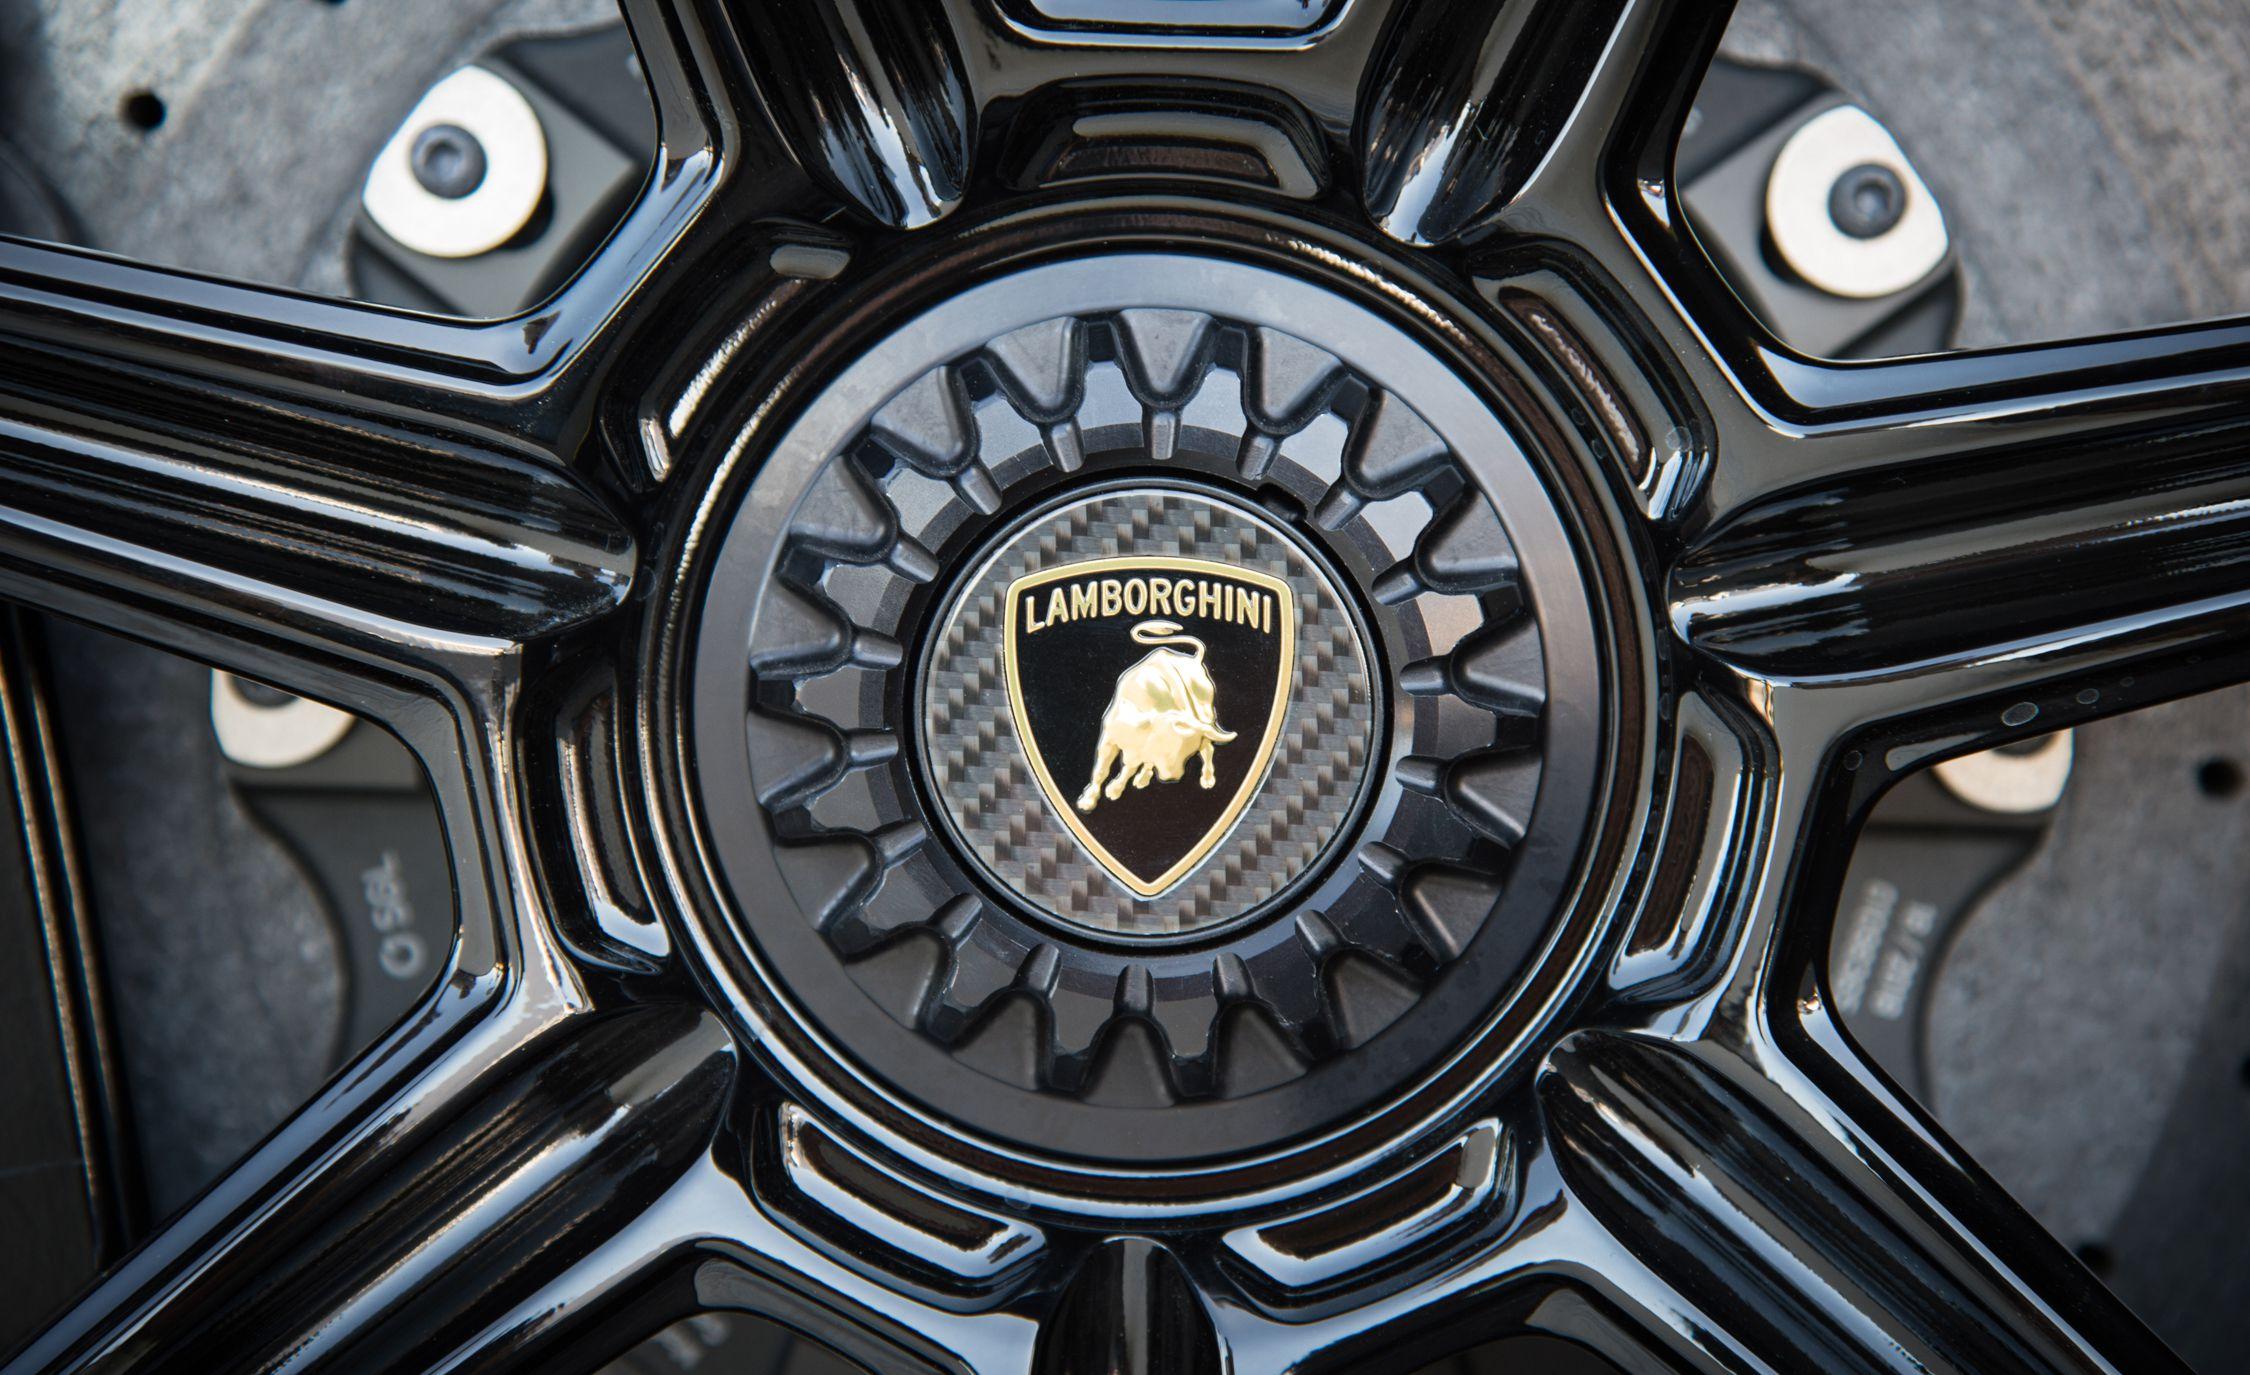 2019 Lamborghini Aventador SVJ Wheel Wallpaper (15)